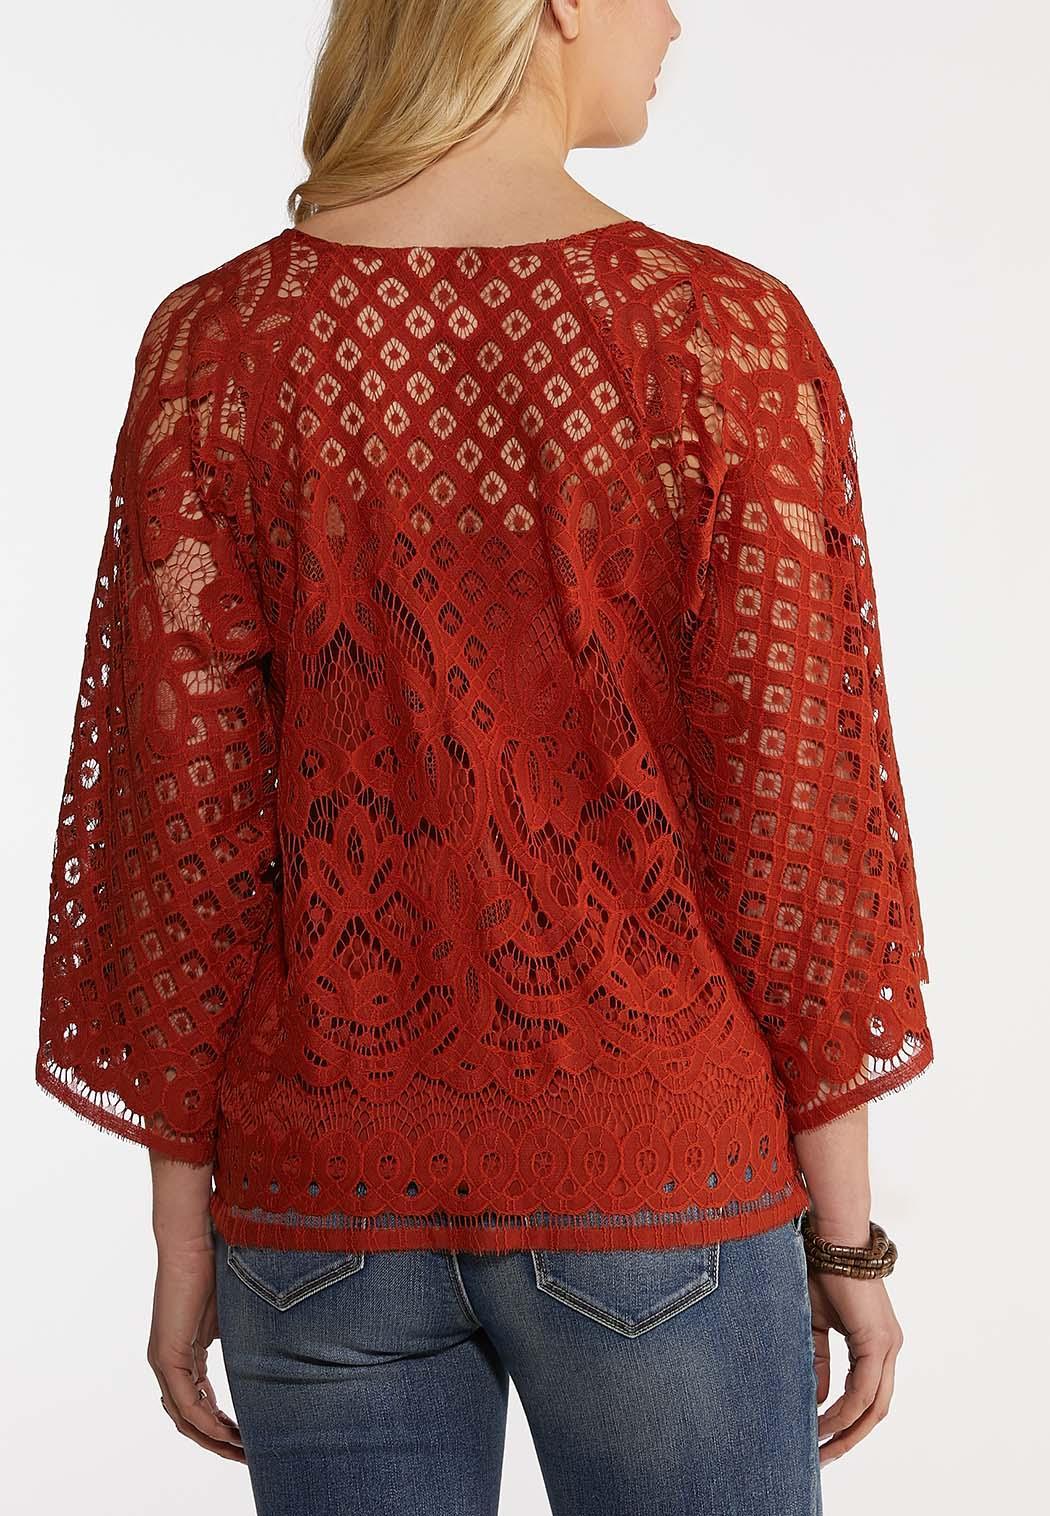 Tassel Tie Crochet Top (Item #44269494)